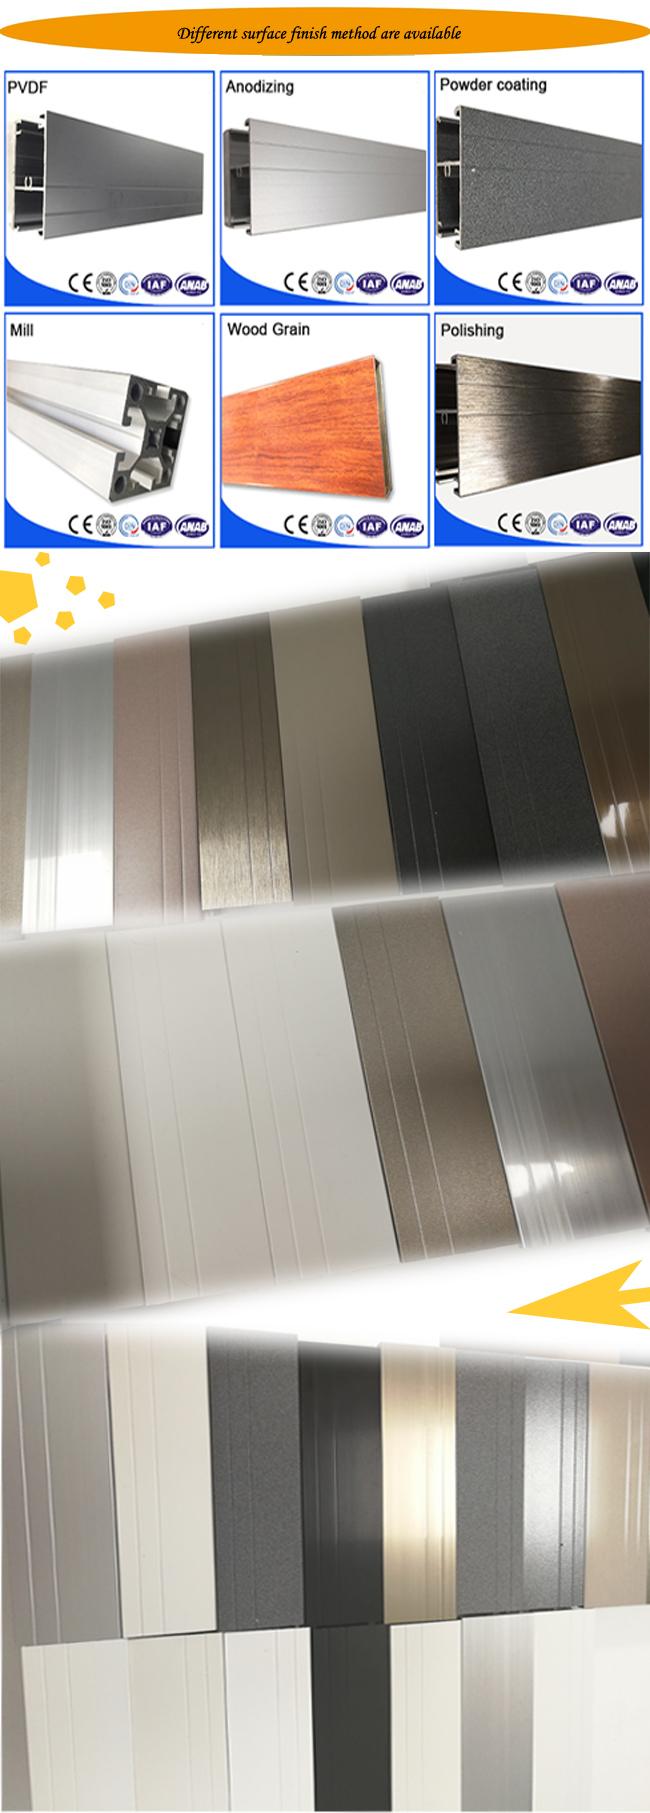 OEM Aluminum/Aluminium Heat Sink Profile with RoHS/Ce/ISO/As2047/Aama